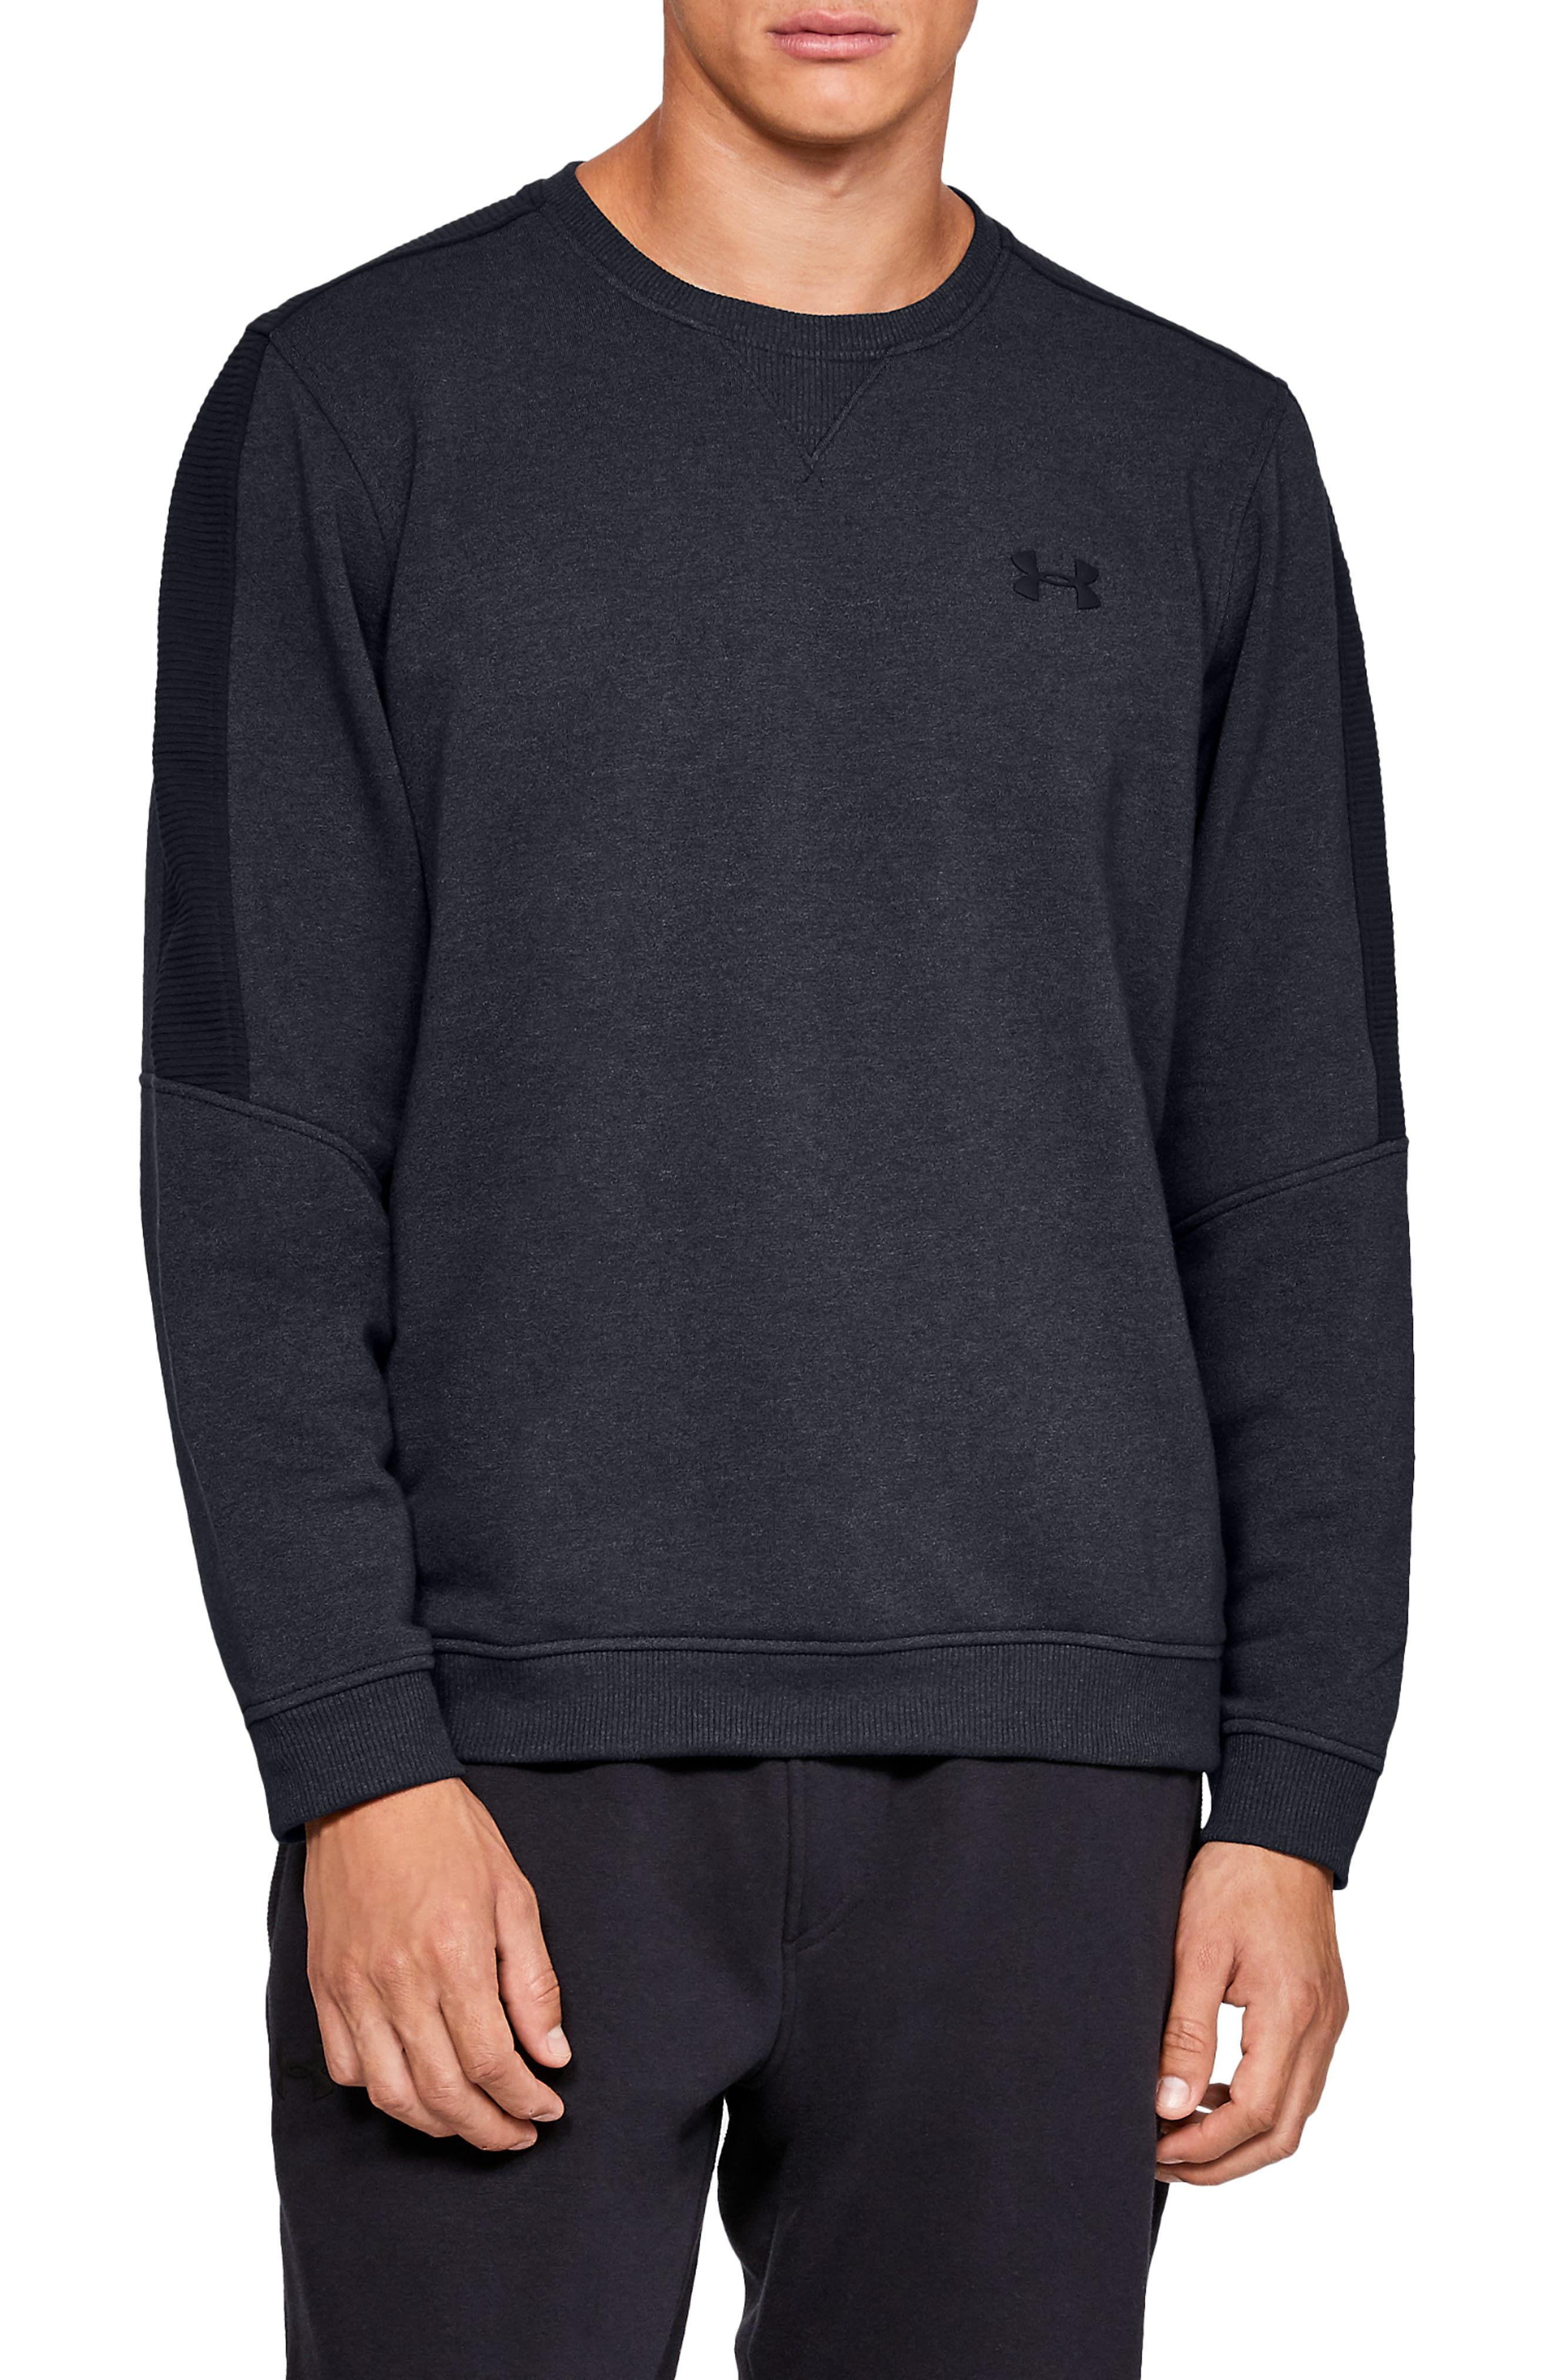 Threadborne Siro Fleece Crewneck Sweatshirt,                             Main thumbnail 1, color,                             BLACK/ BLACK/ BLACK